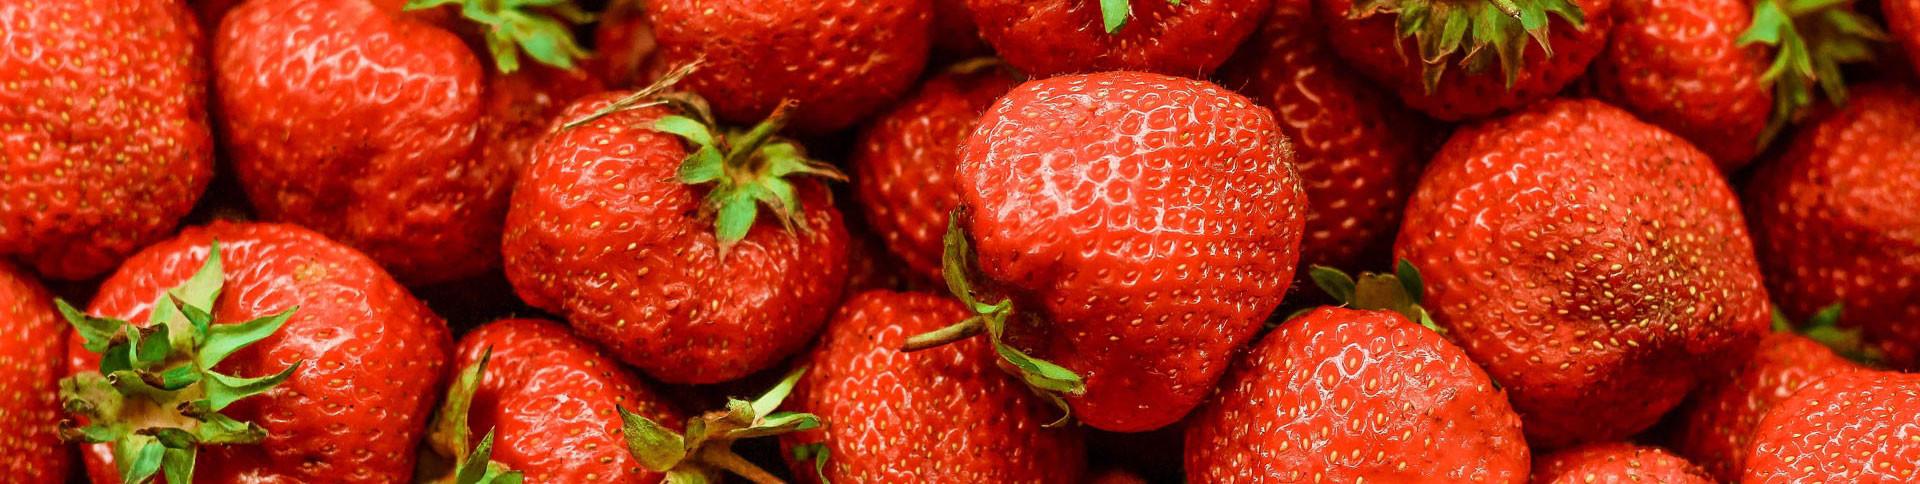 Fruits & Berries